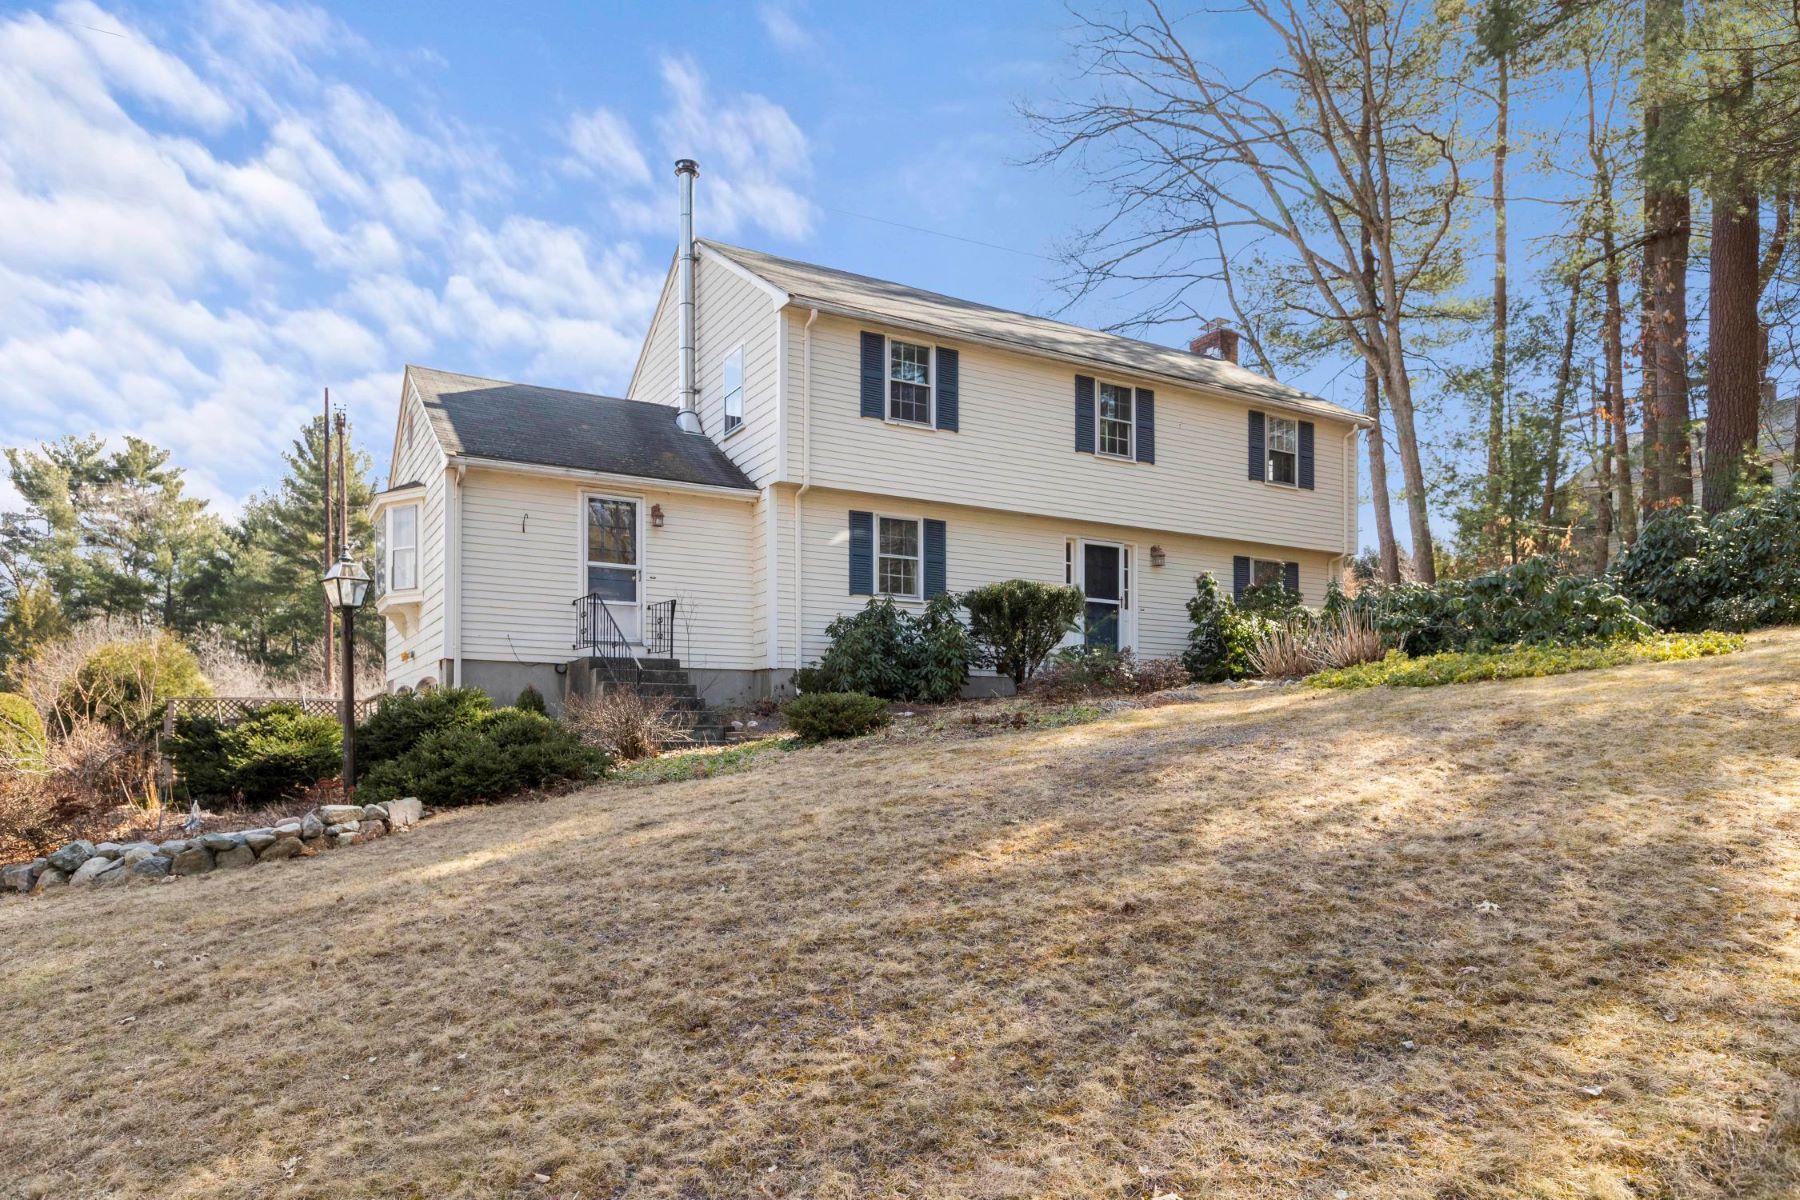 Single Family Homes 为 销售 在 11 Meadowview Rd 韦兰, 马萨诸塞州 01778 美国